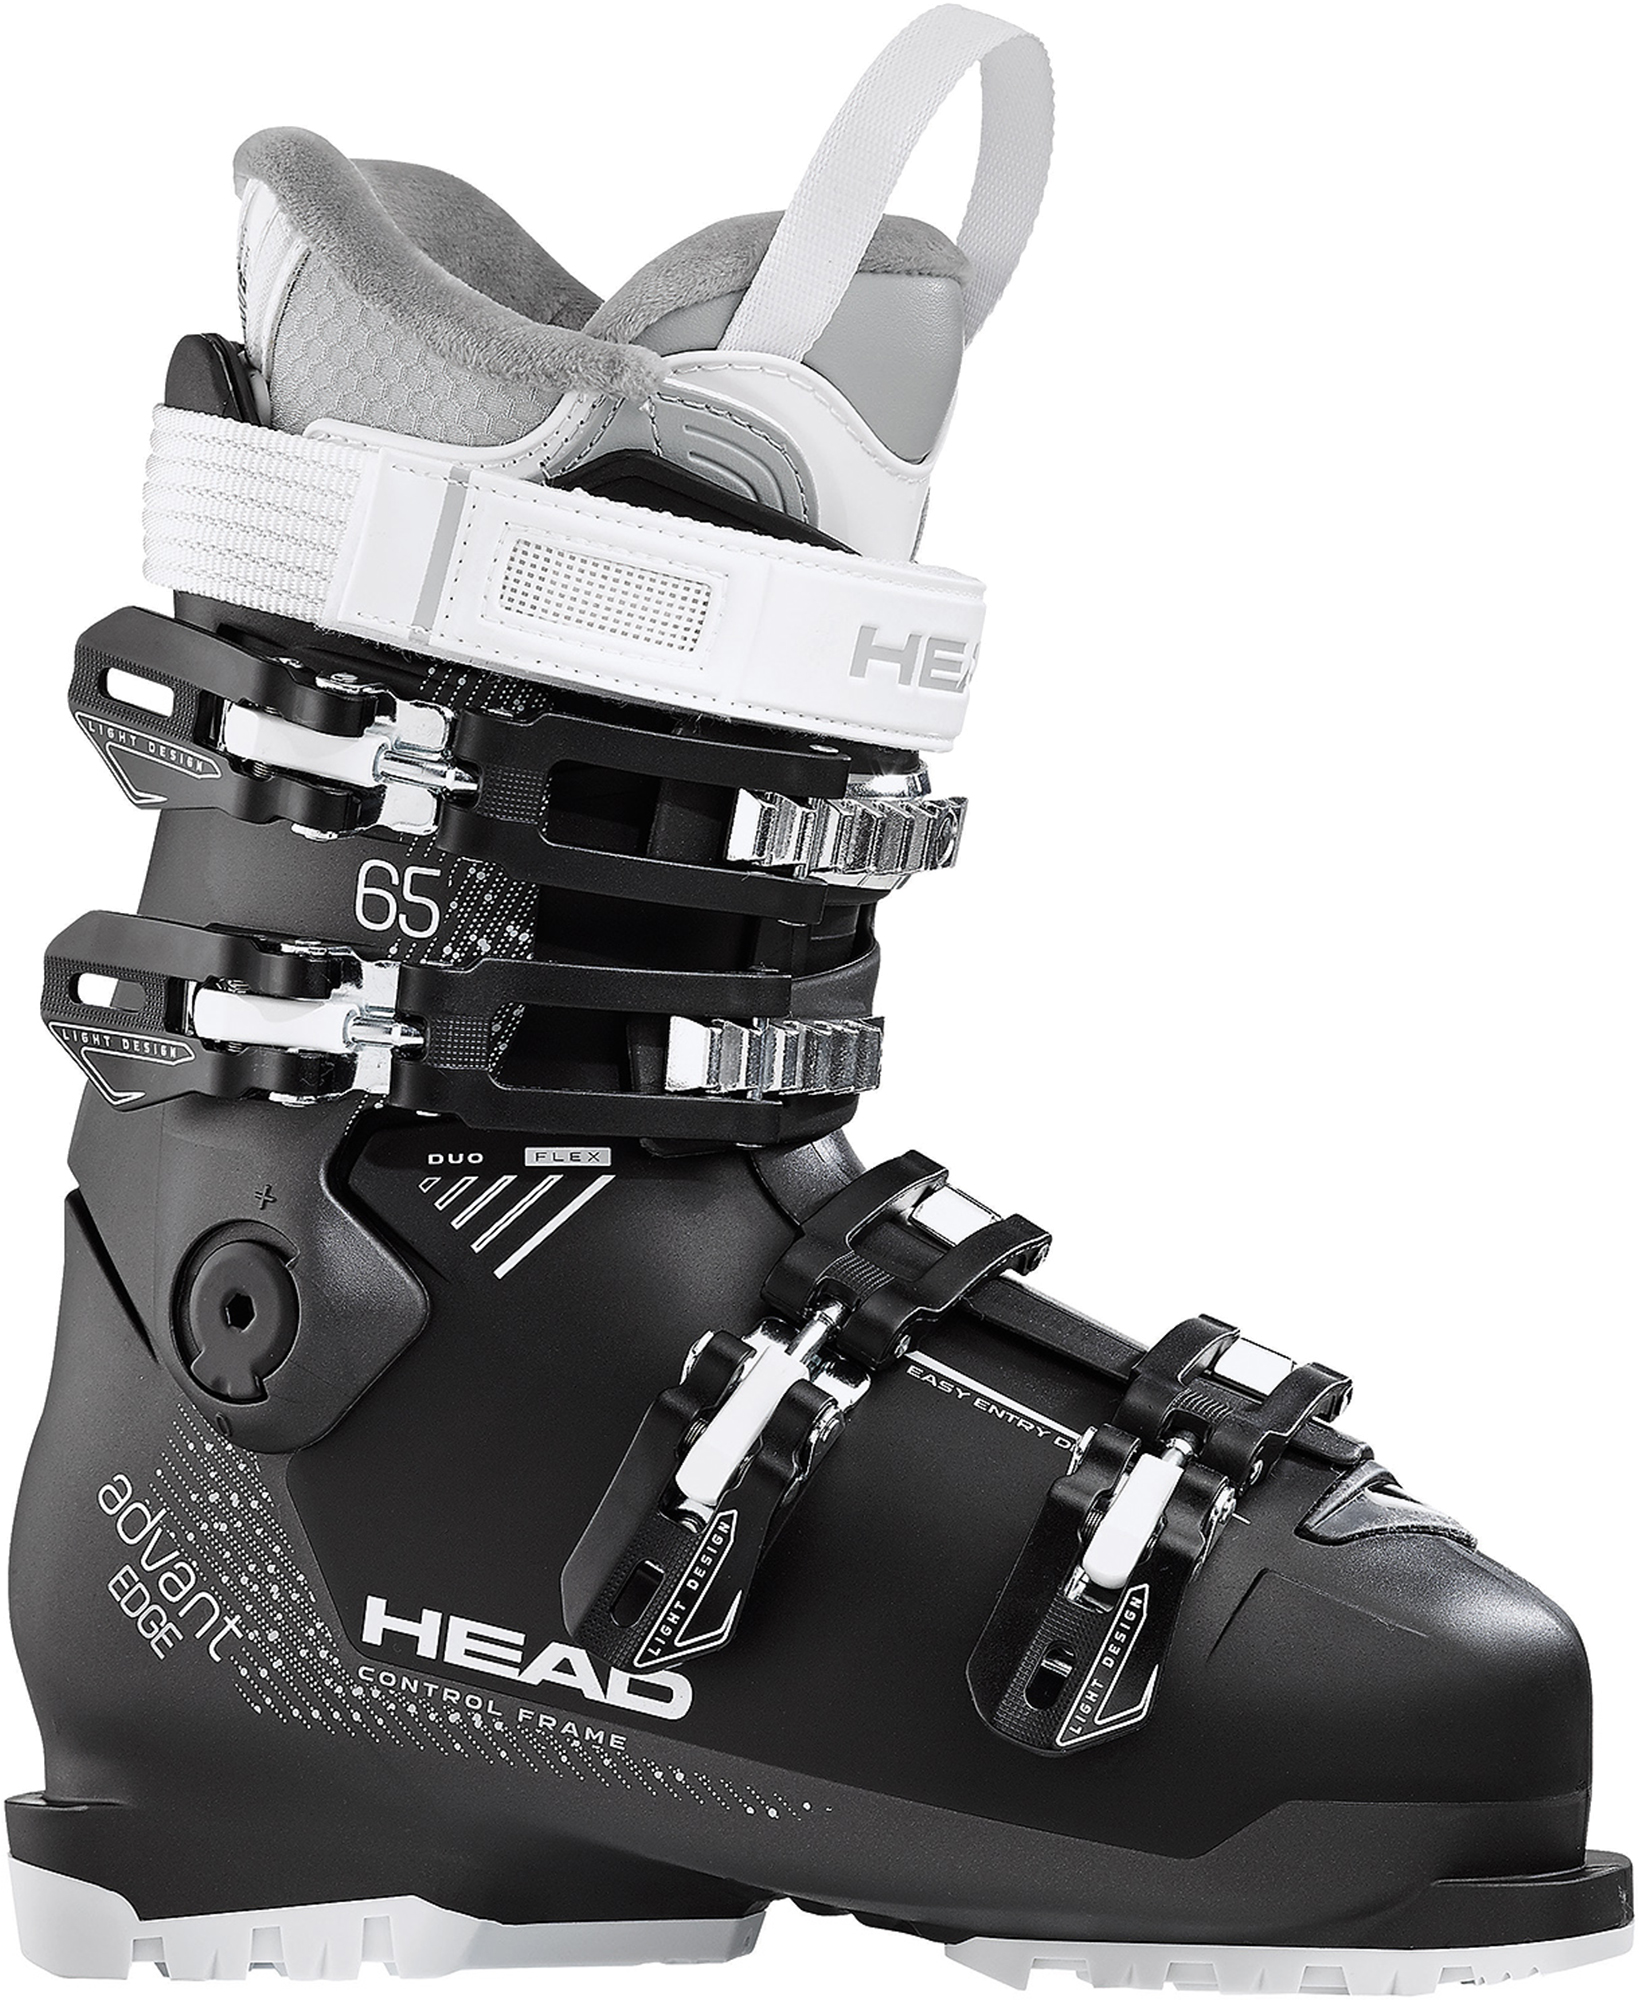 Head Ботинки горнолыжные женские Advant Edge 65, размер 40,5